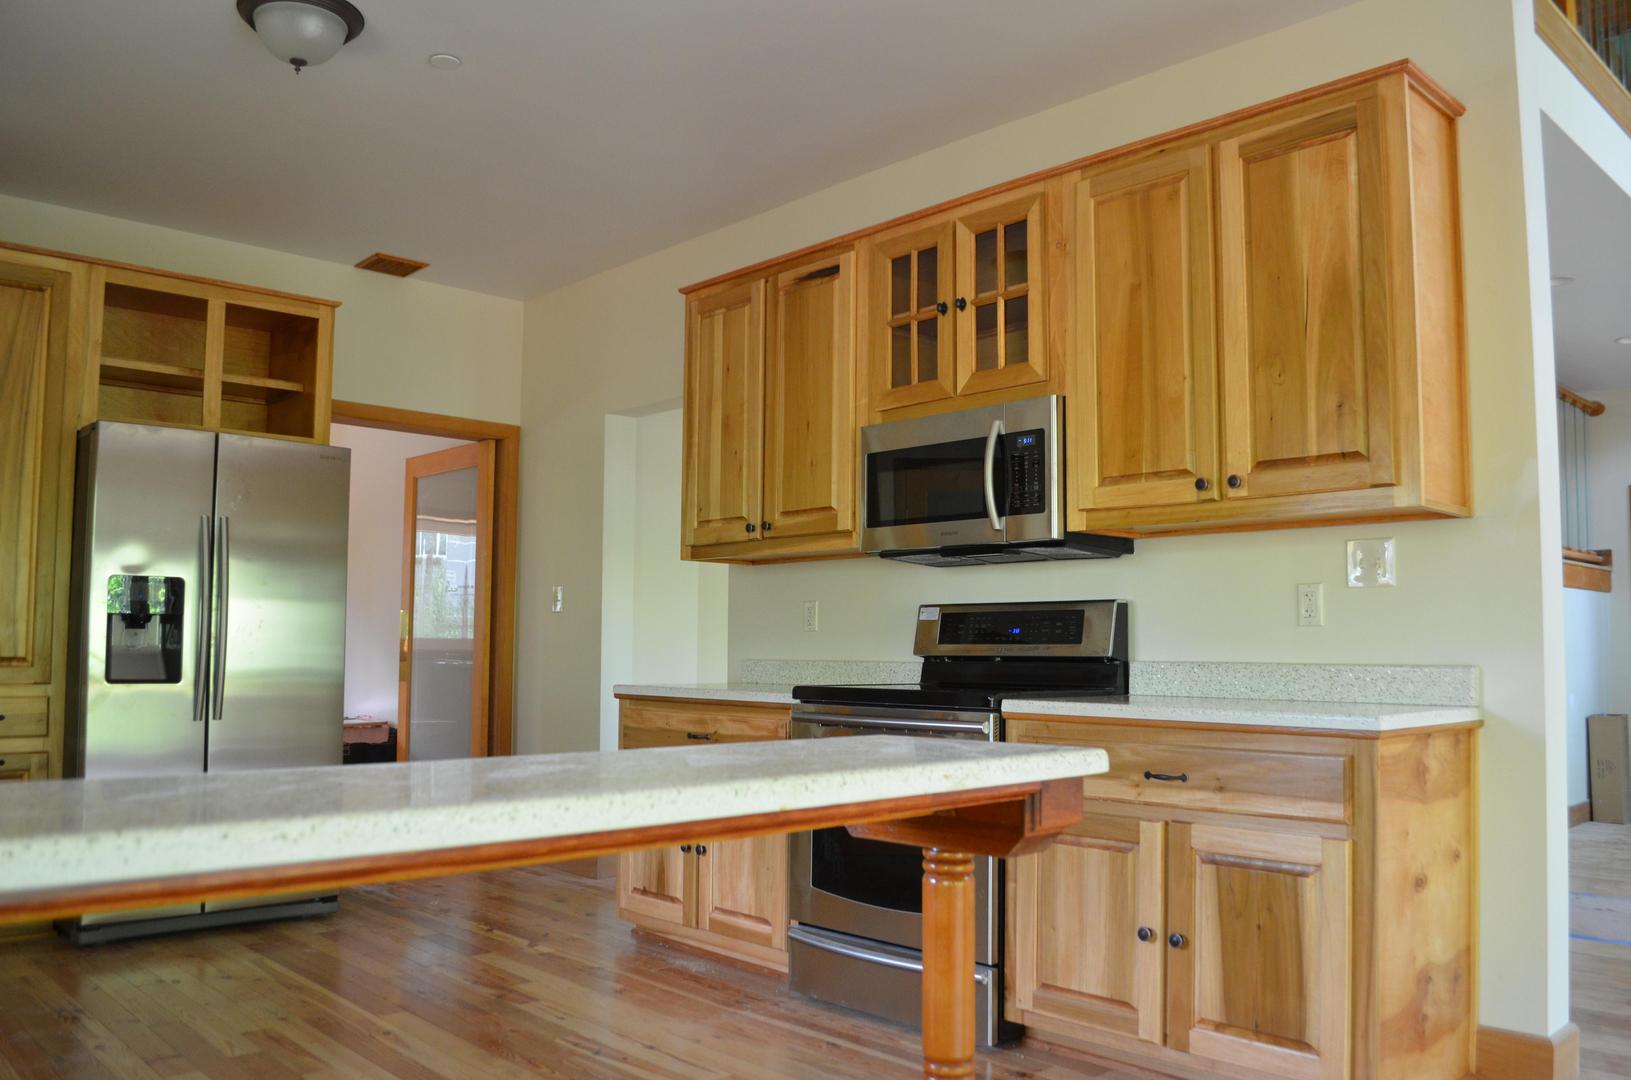 Poplar Wood For Kitchen Cabinets   Digitalstudiosweb.com